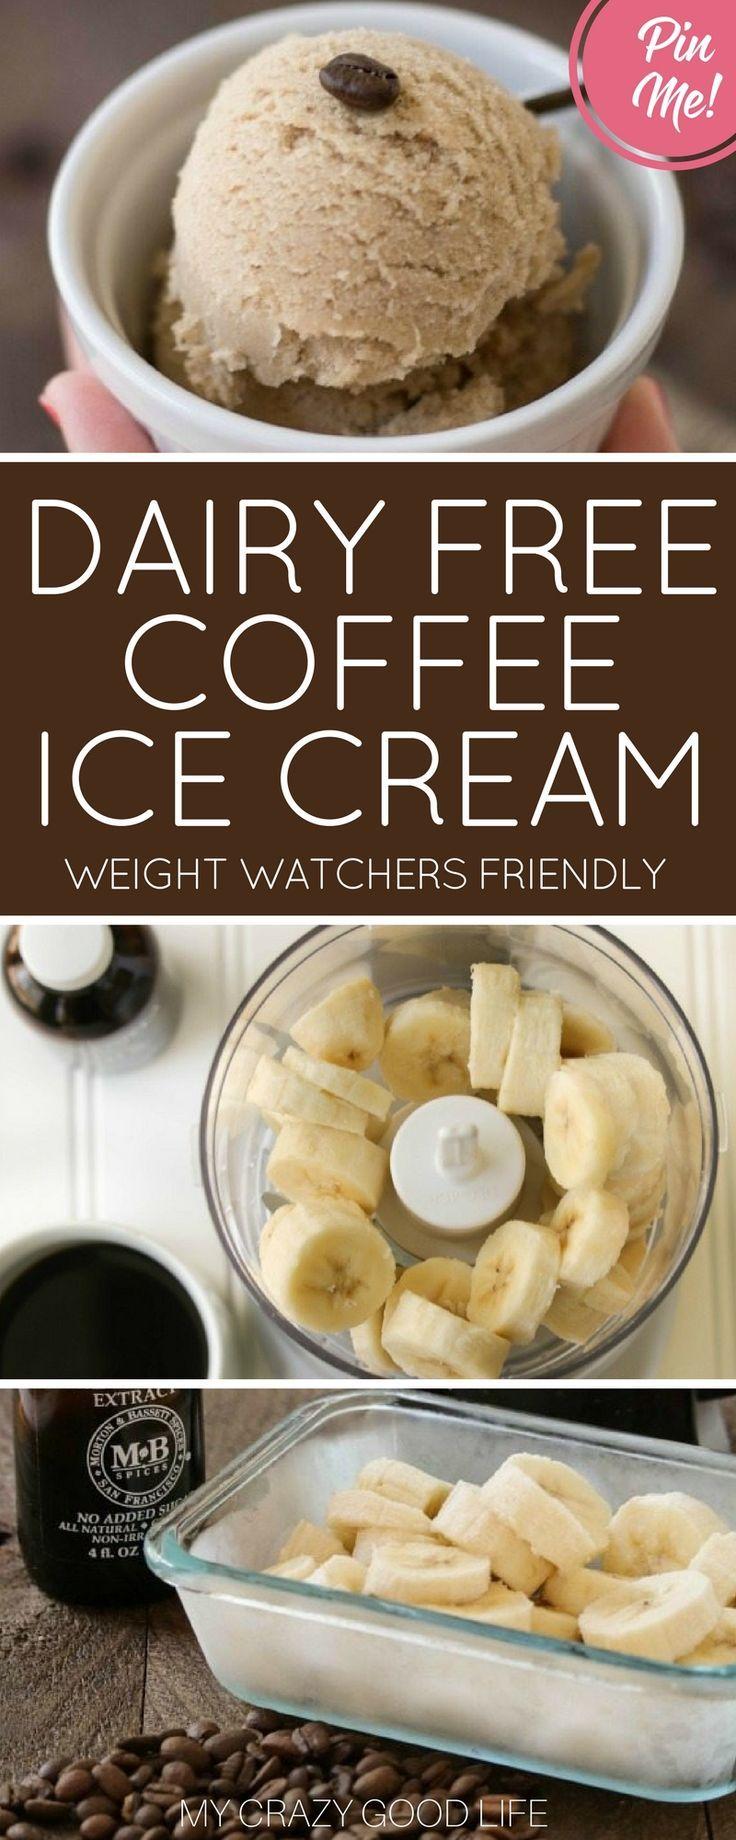 Dairy Free Coffee Ice Cream Recipe Gluten Free My Crazy Good